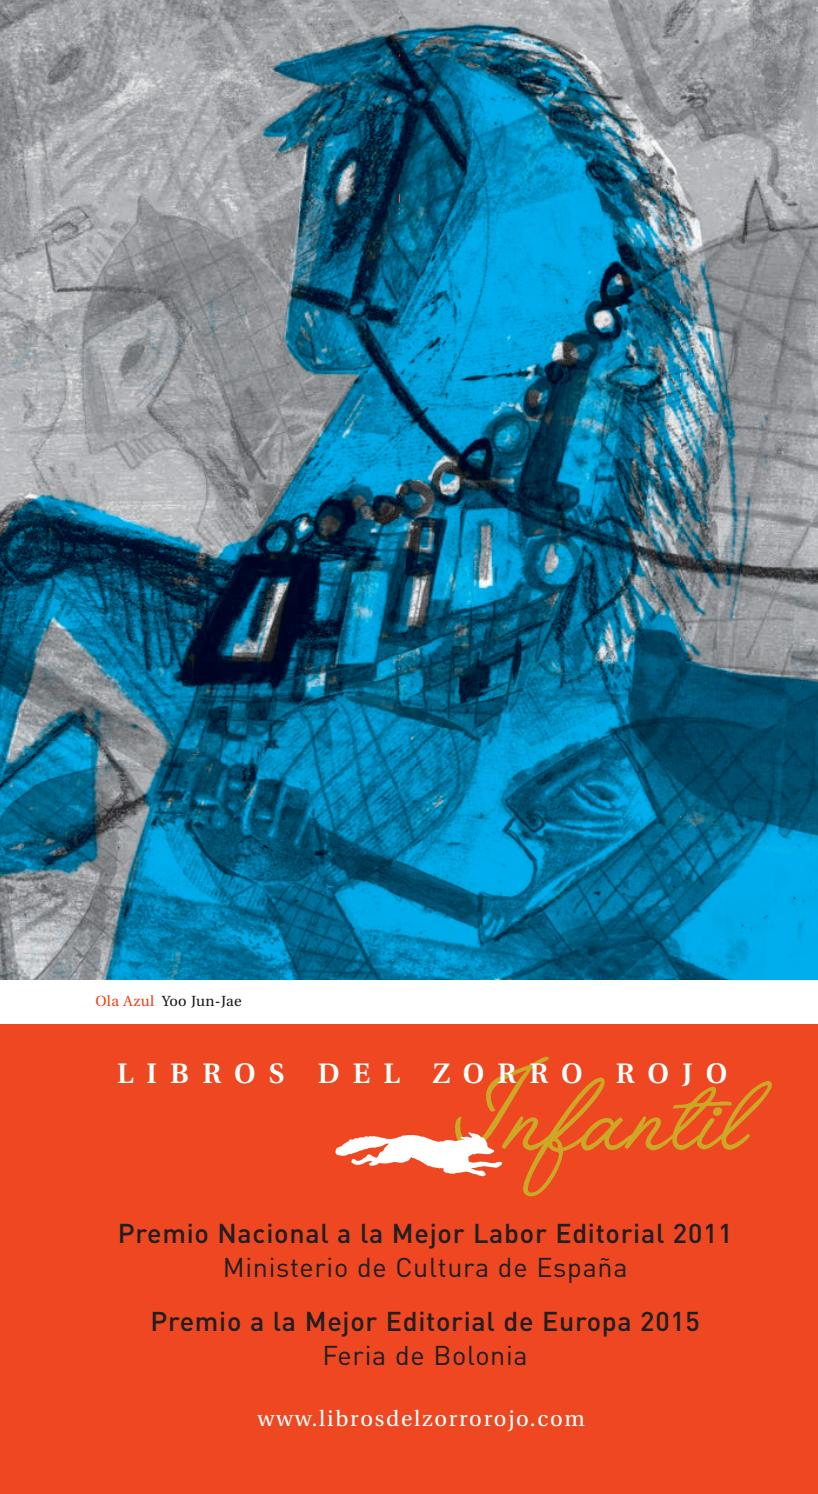 Catálogo infantil primavera 2018 by Libros del Zorro Rojo - issuu